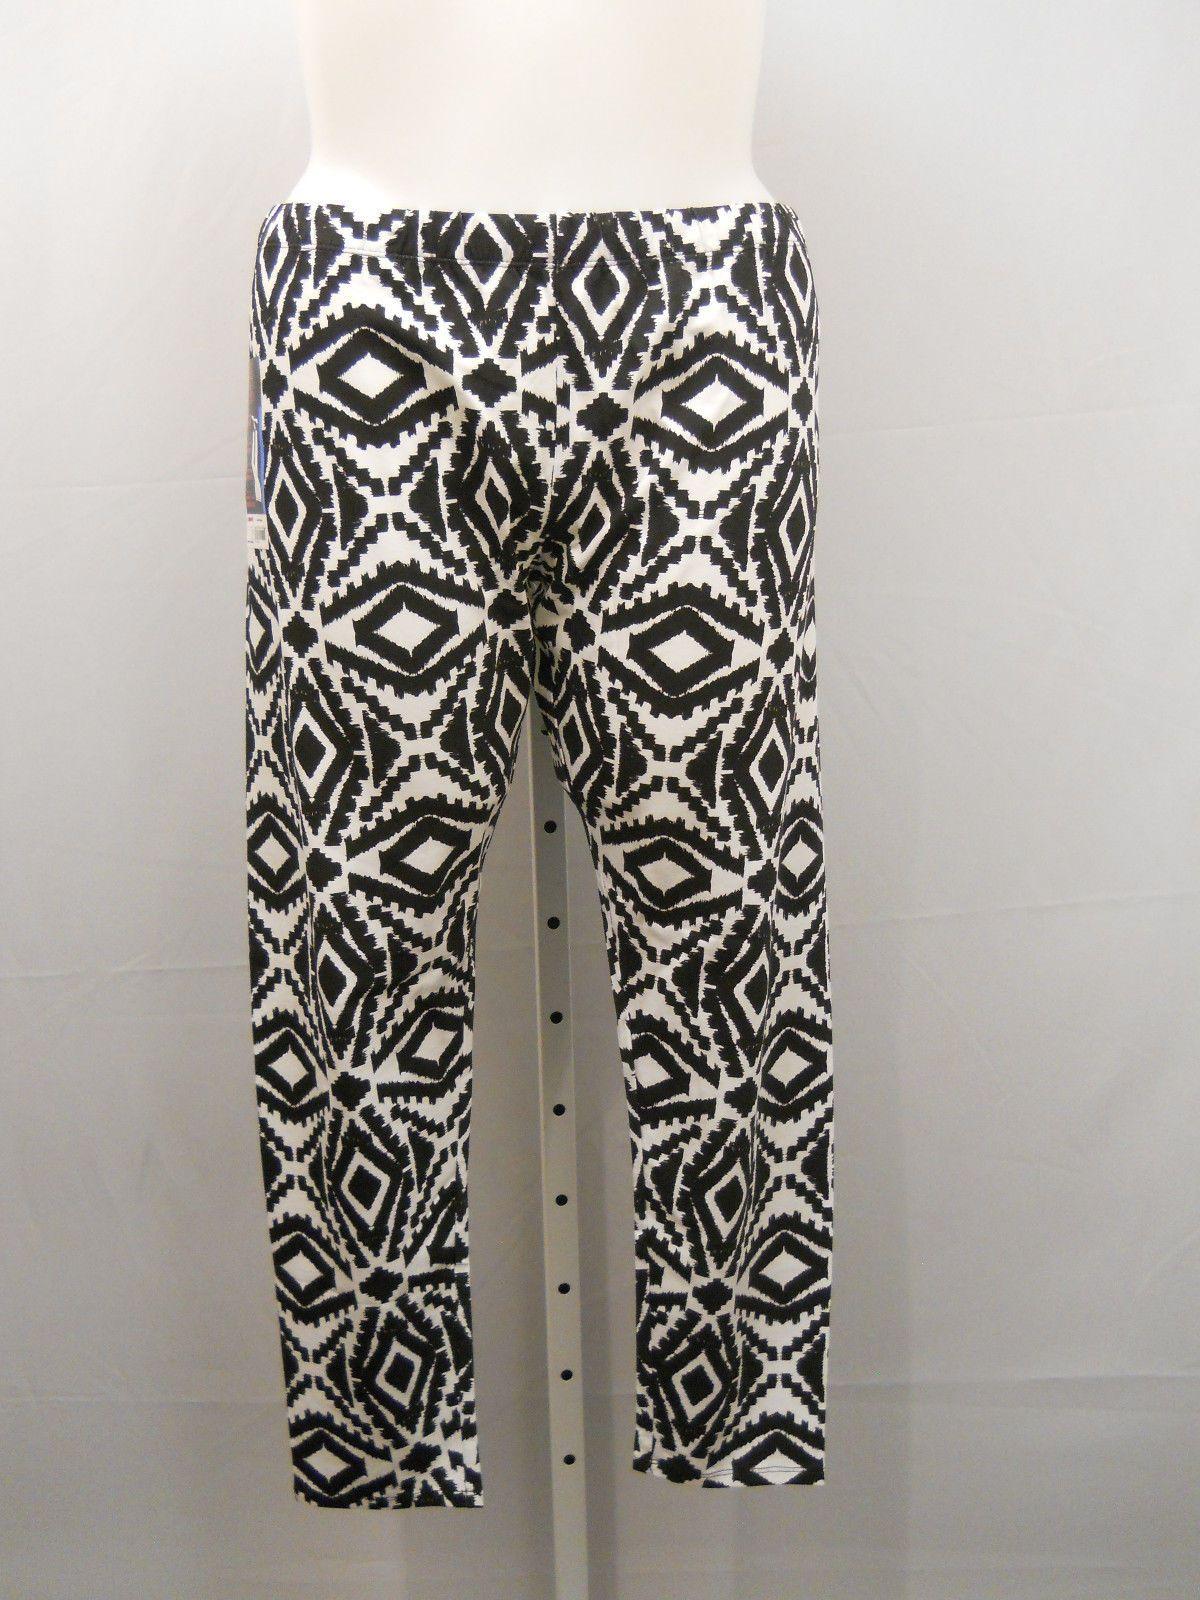 eda94dc5ccfea1 PLUS SIZE 4X Womens Ankle Leggings NO BOUNDARIES Mid Rise Aztec Print Inseam  29 For Sale - Item #1645695